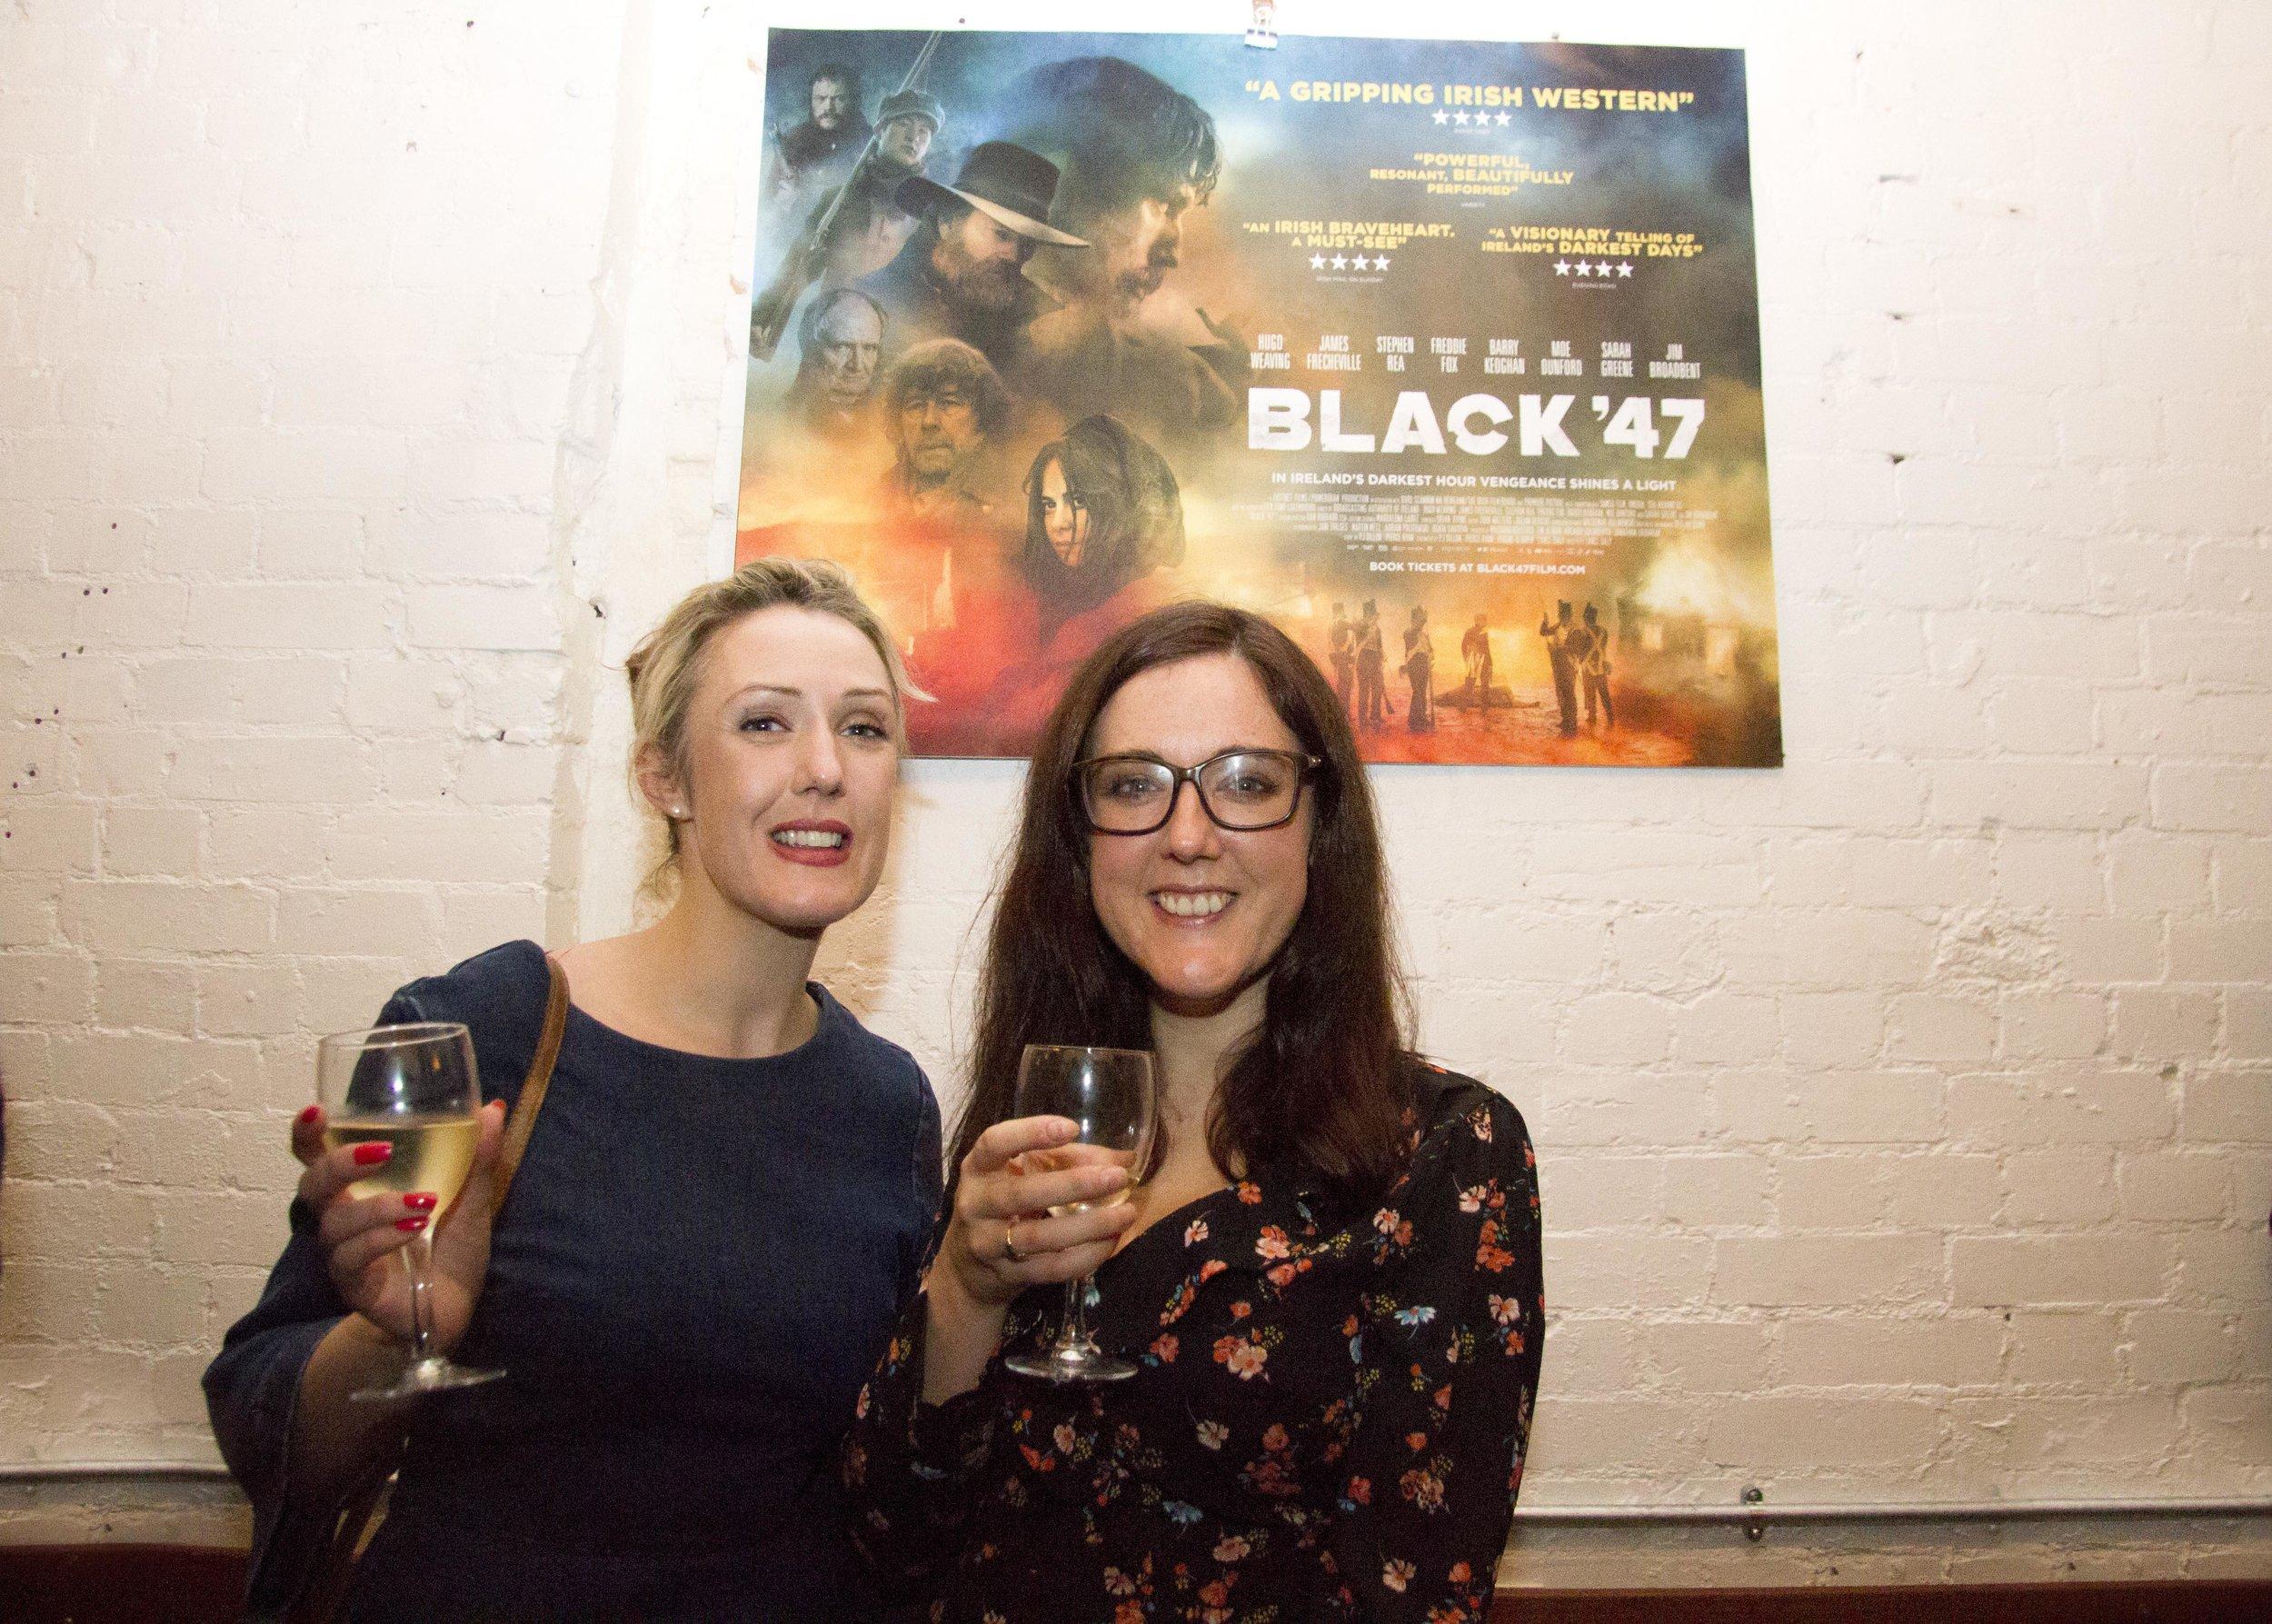 Black 47 London Premiere 2018 Photos courtesy of Noel Mullen Irish Film London 65.jpg